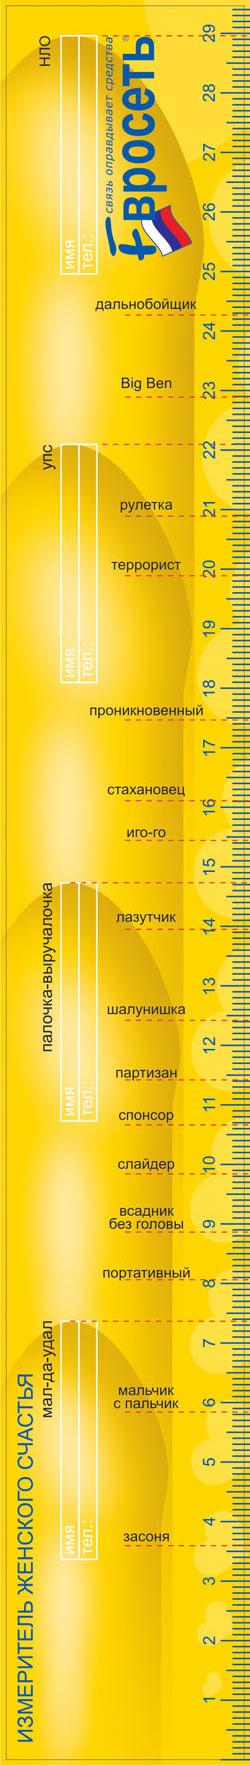 lineyka.jpg